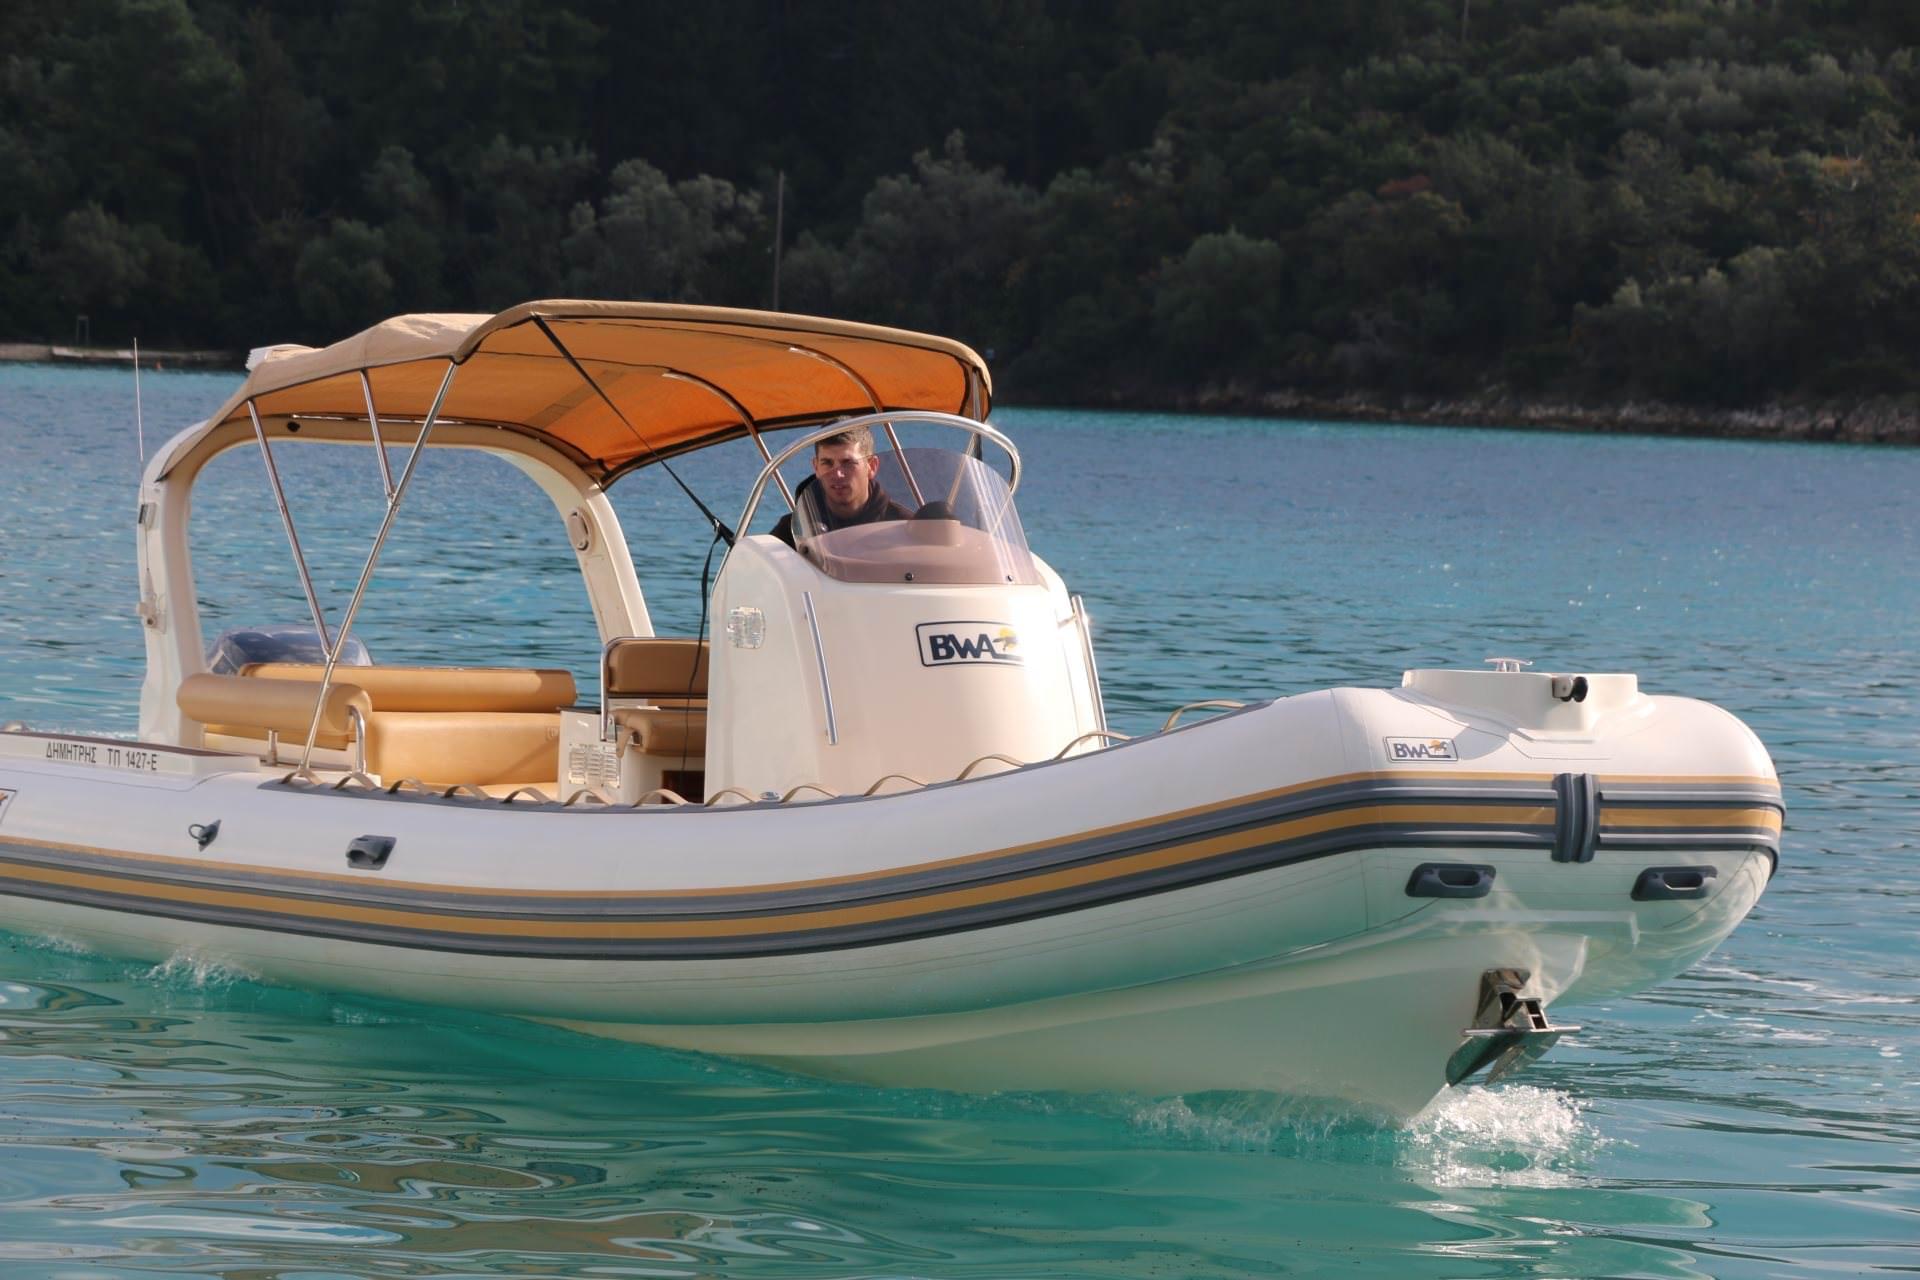 joy5 (6) Trident Boats